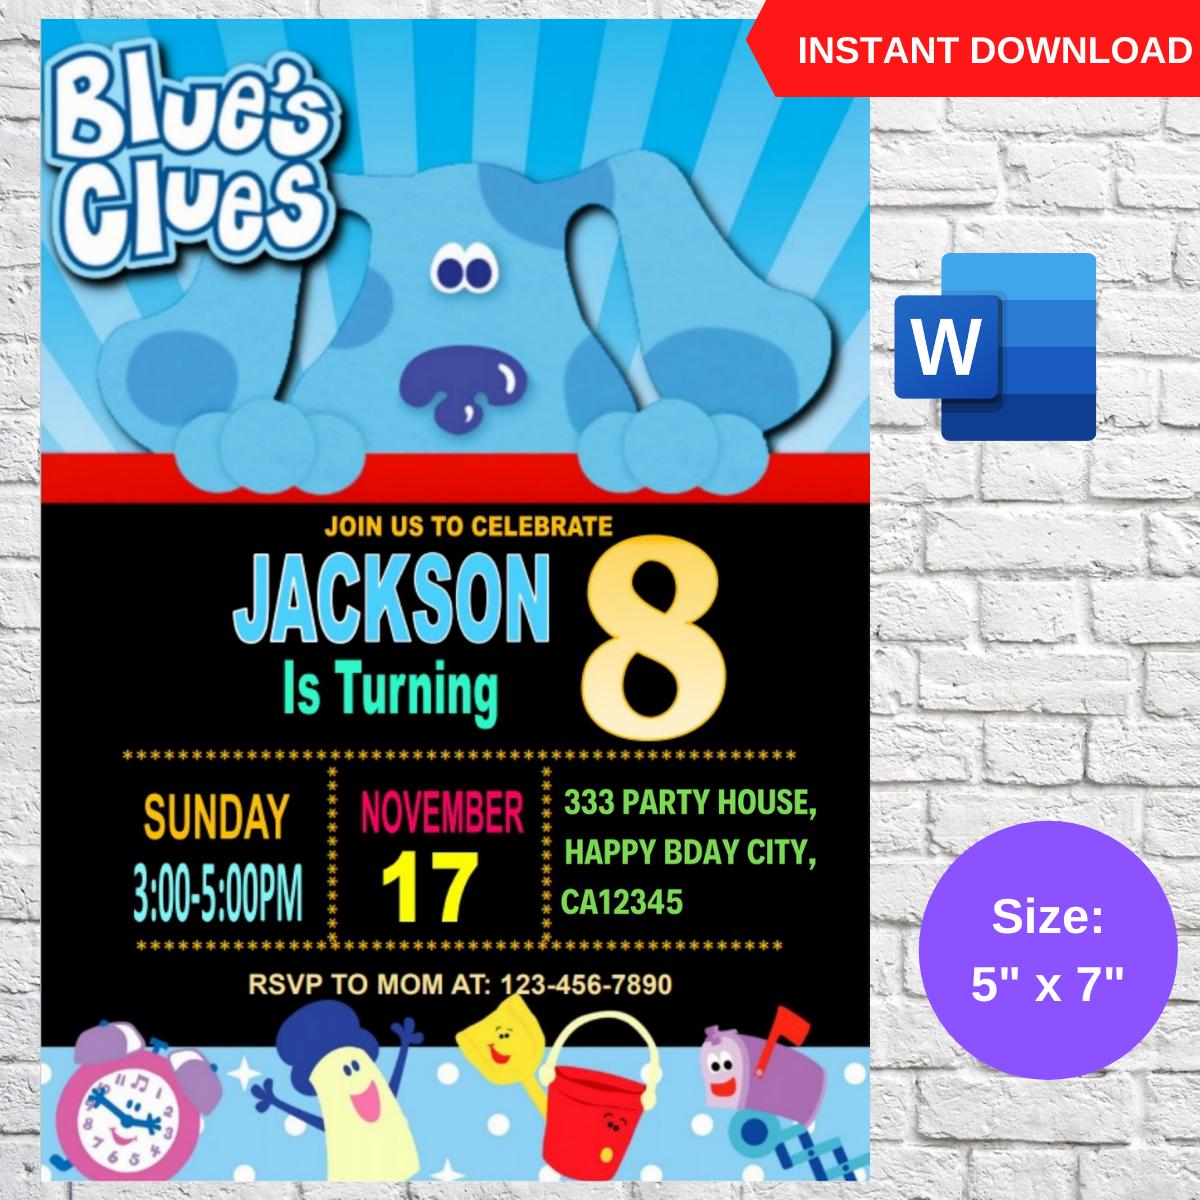 Blues Clues Birthday Invitation Template